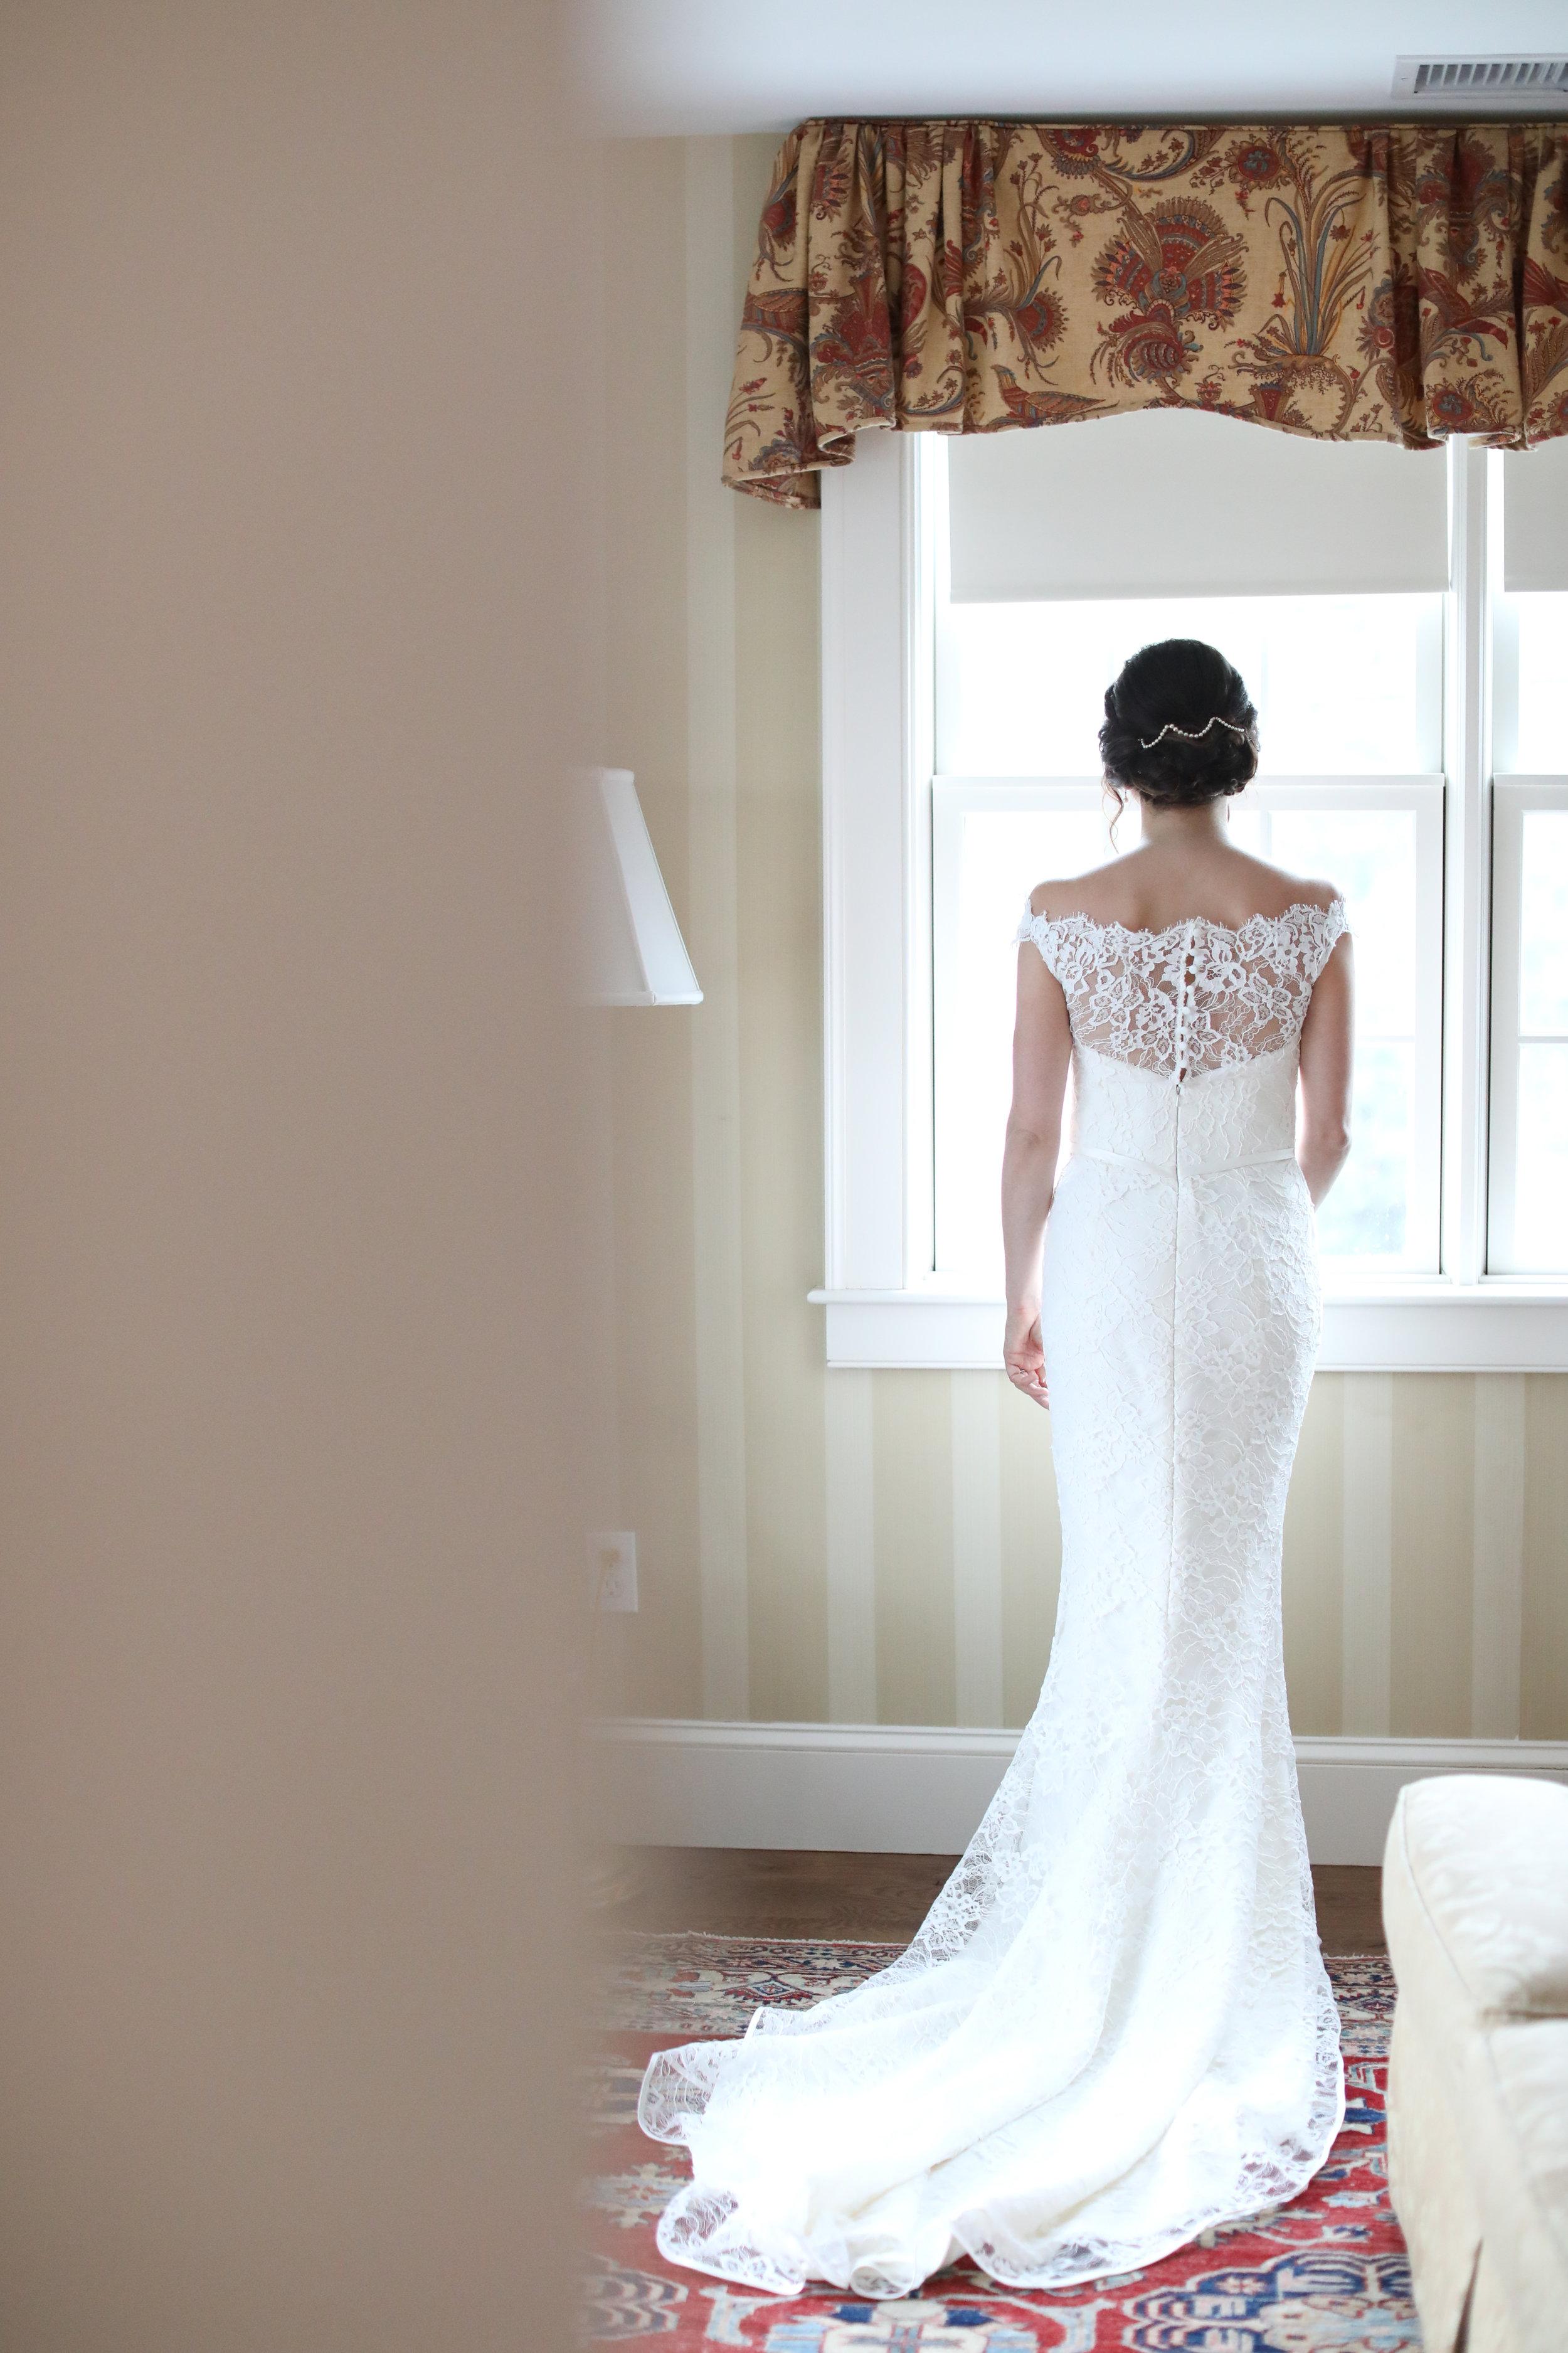 Lace Factory Wedding CT Wedding Planner  - 21.jpg